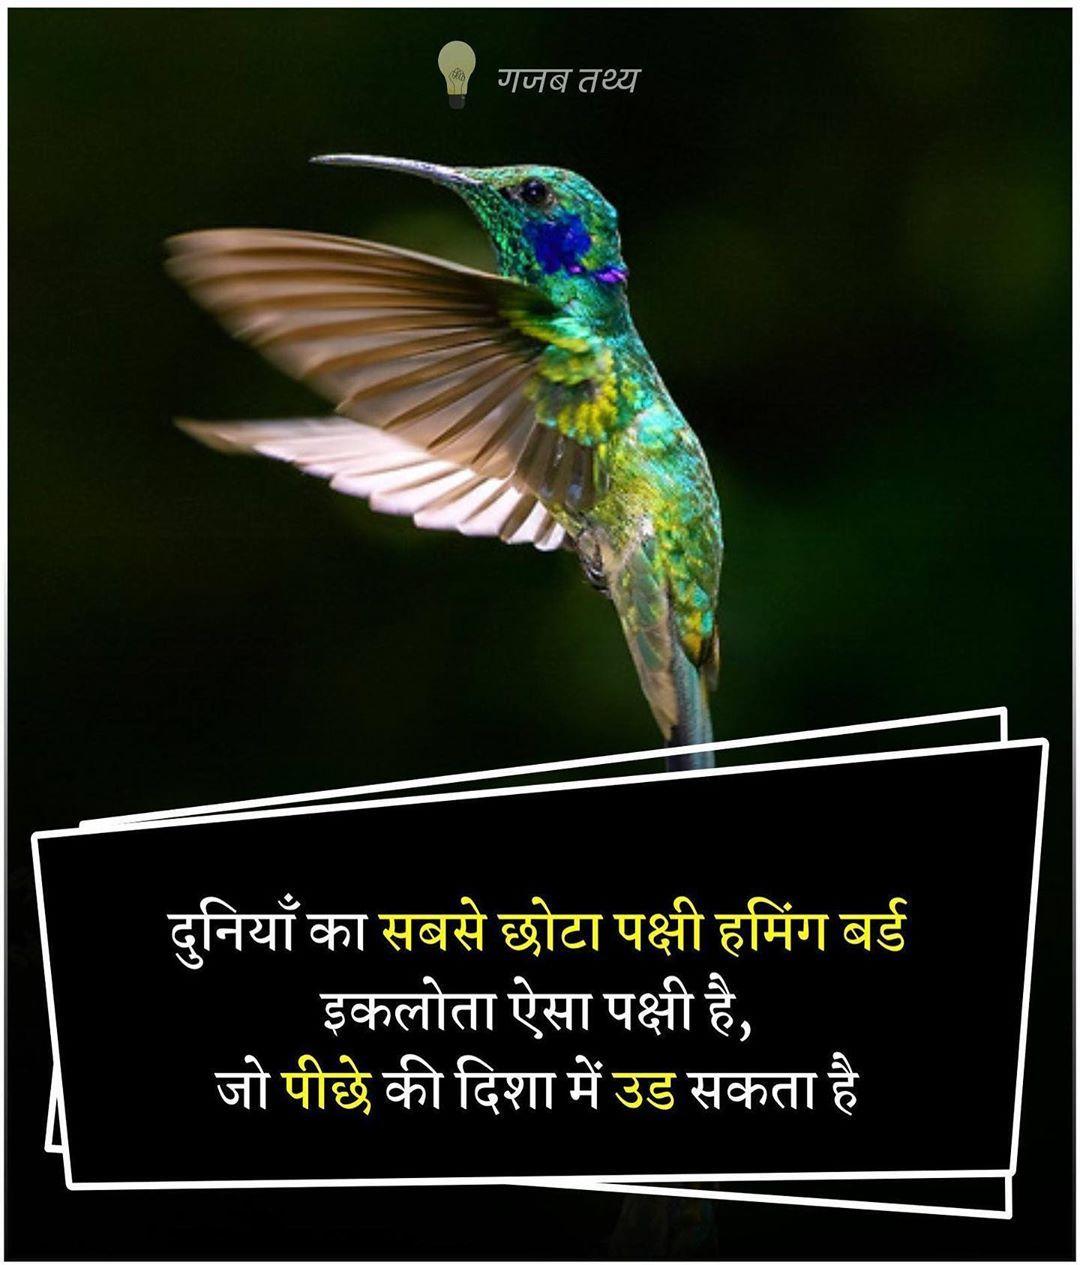 Pin by Rinku Singh on रोचक तथ्य(Rochak Tathya) | Some